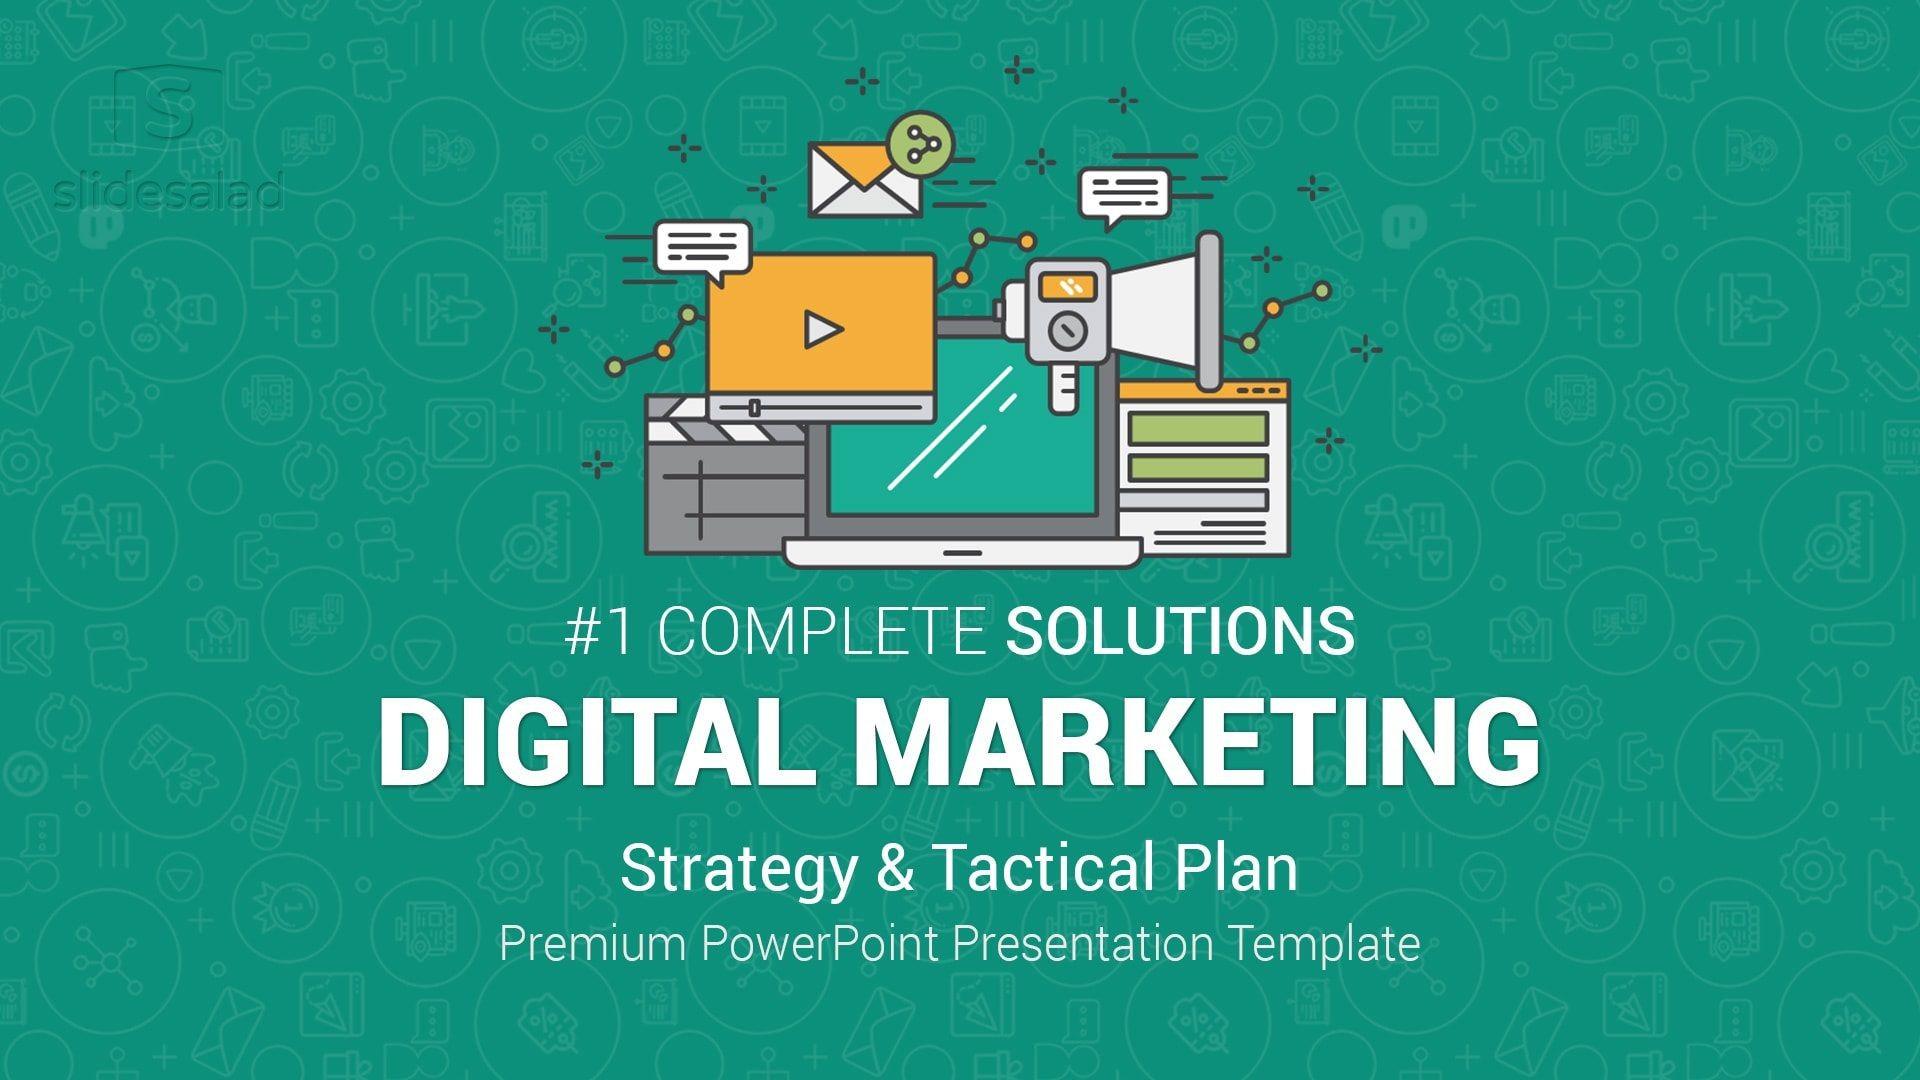 002 Unforgettable Free Digital Marketing Plan Template Ppt High Definition 1920